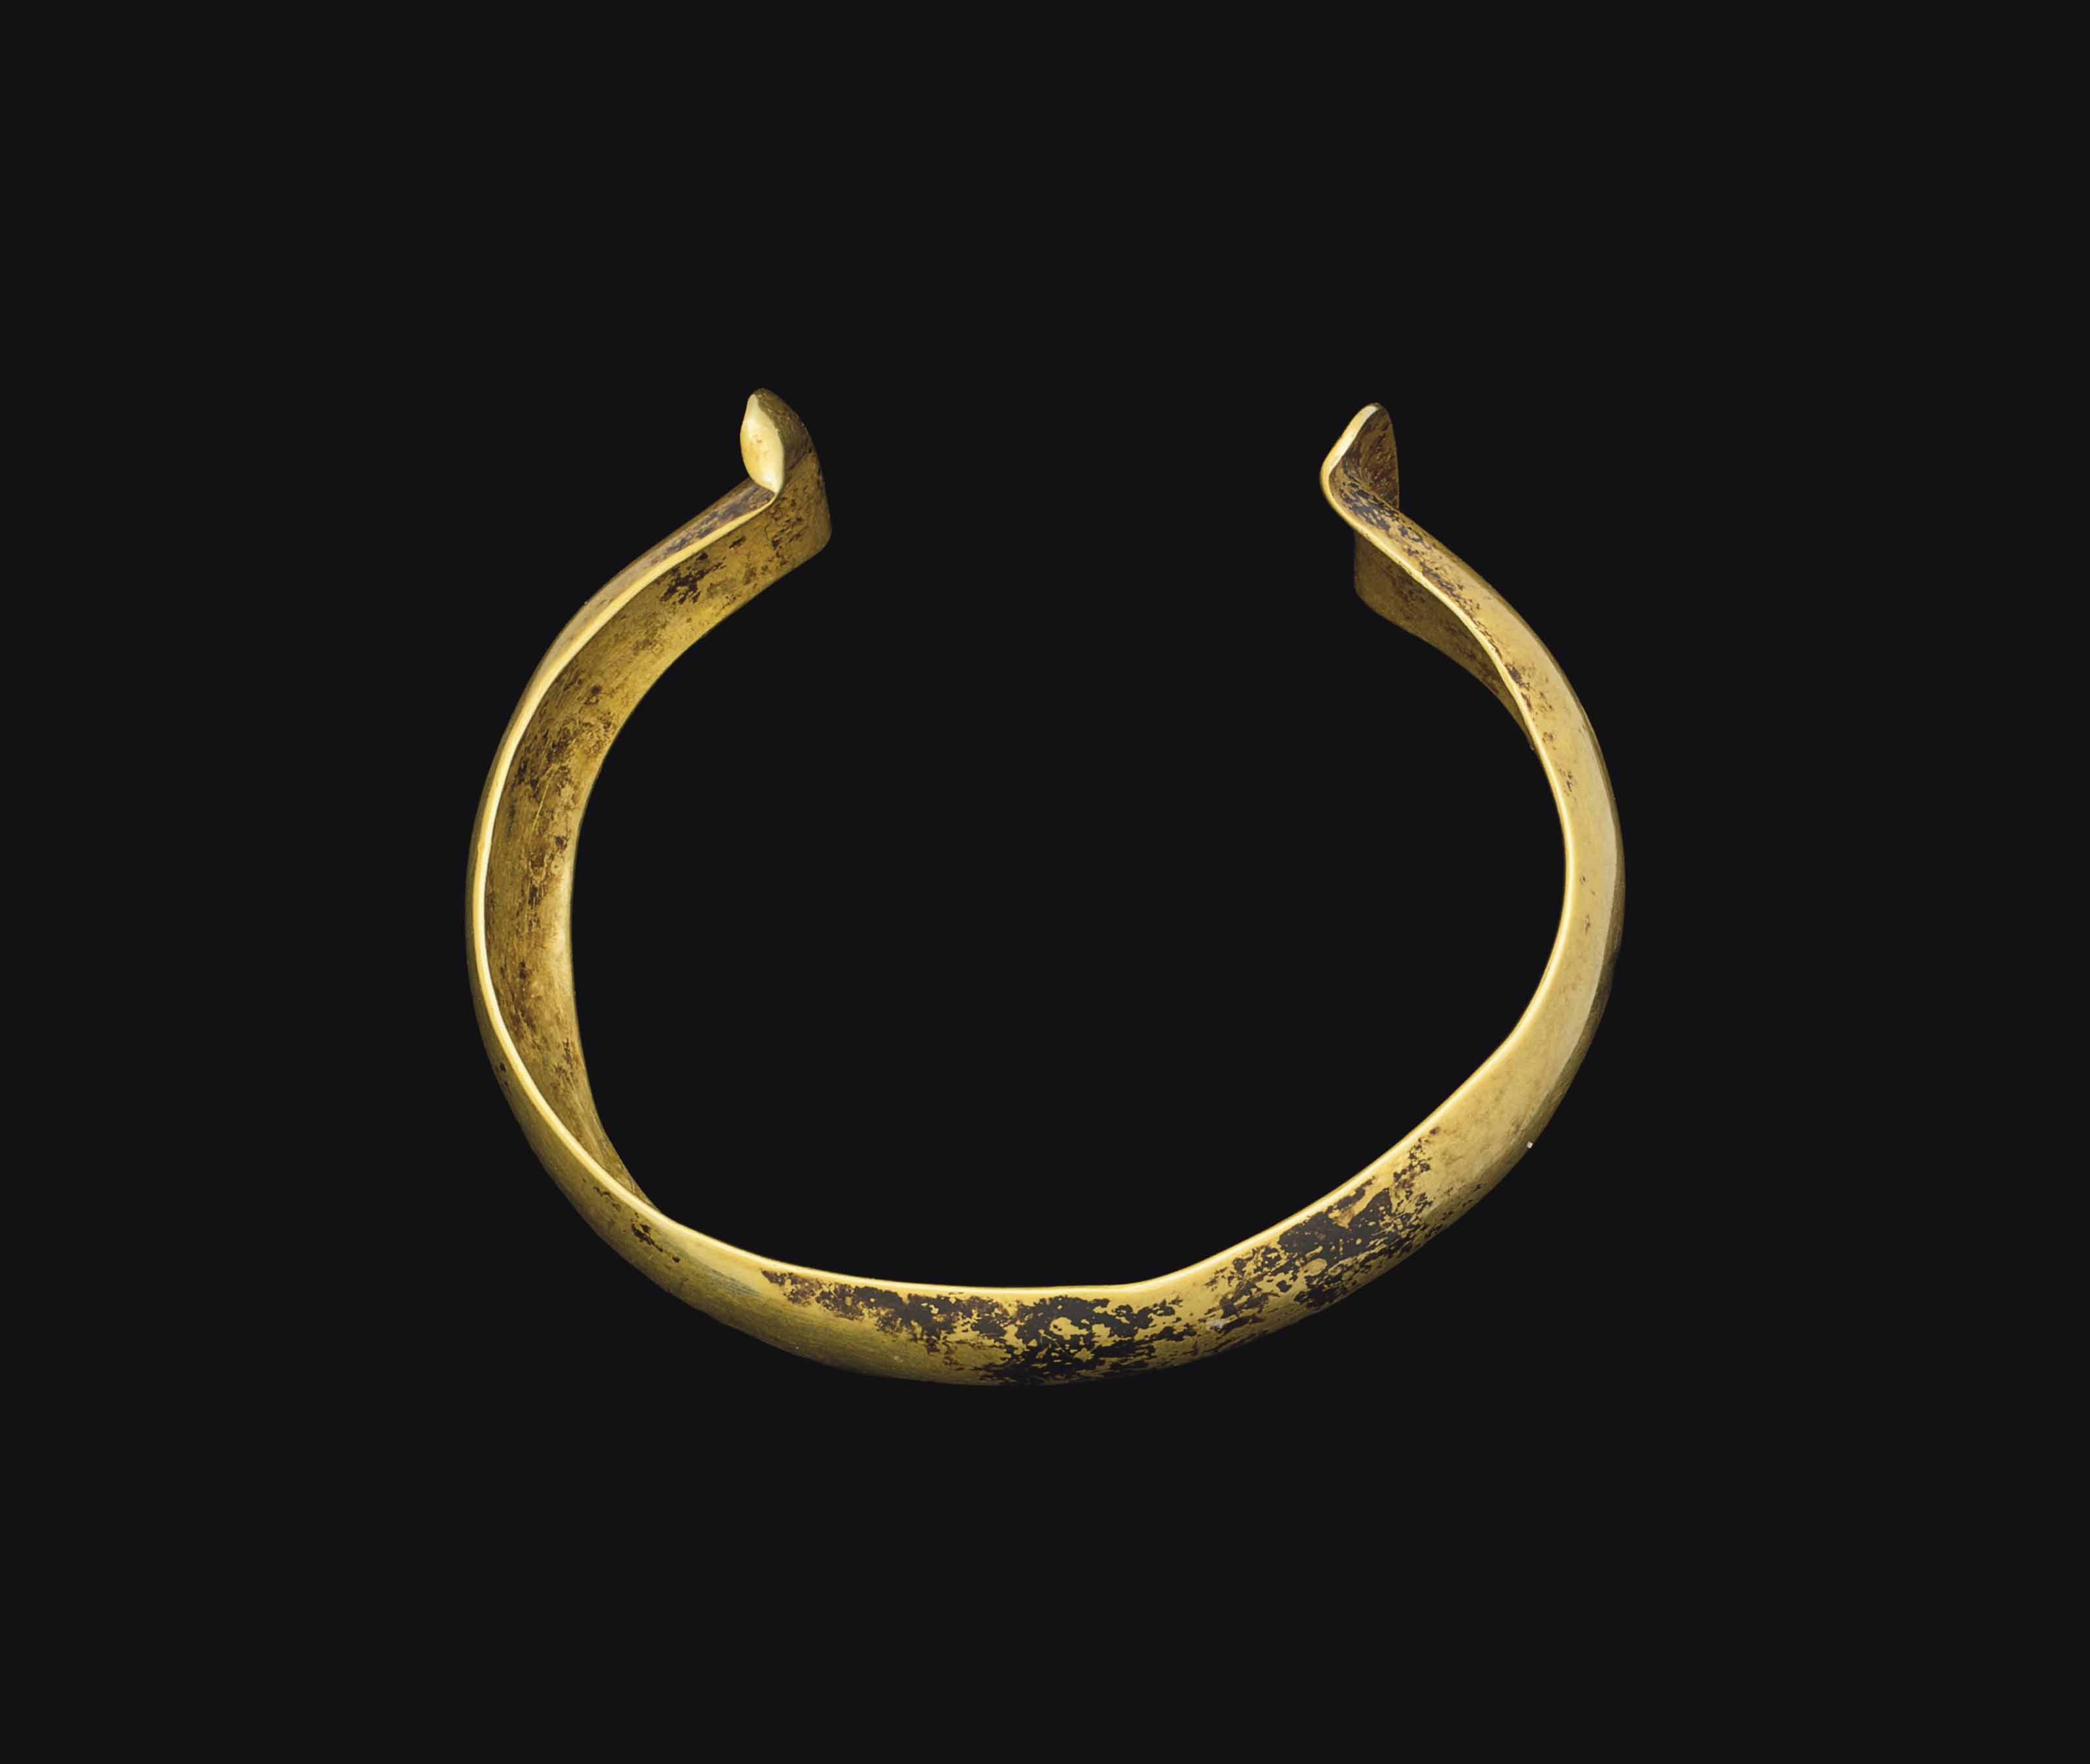 A EUROPEAN GOLD BRACELET